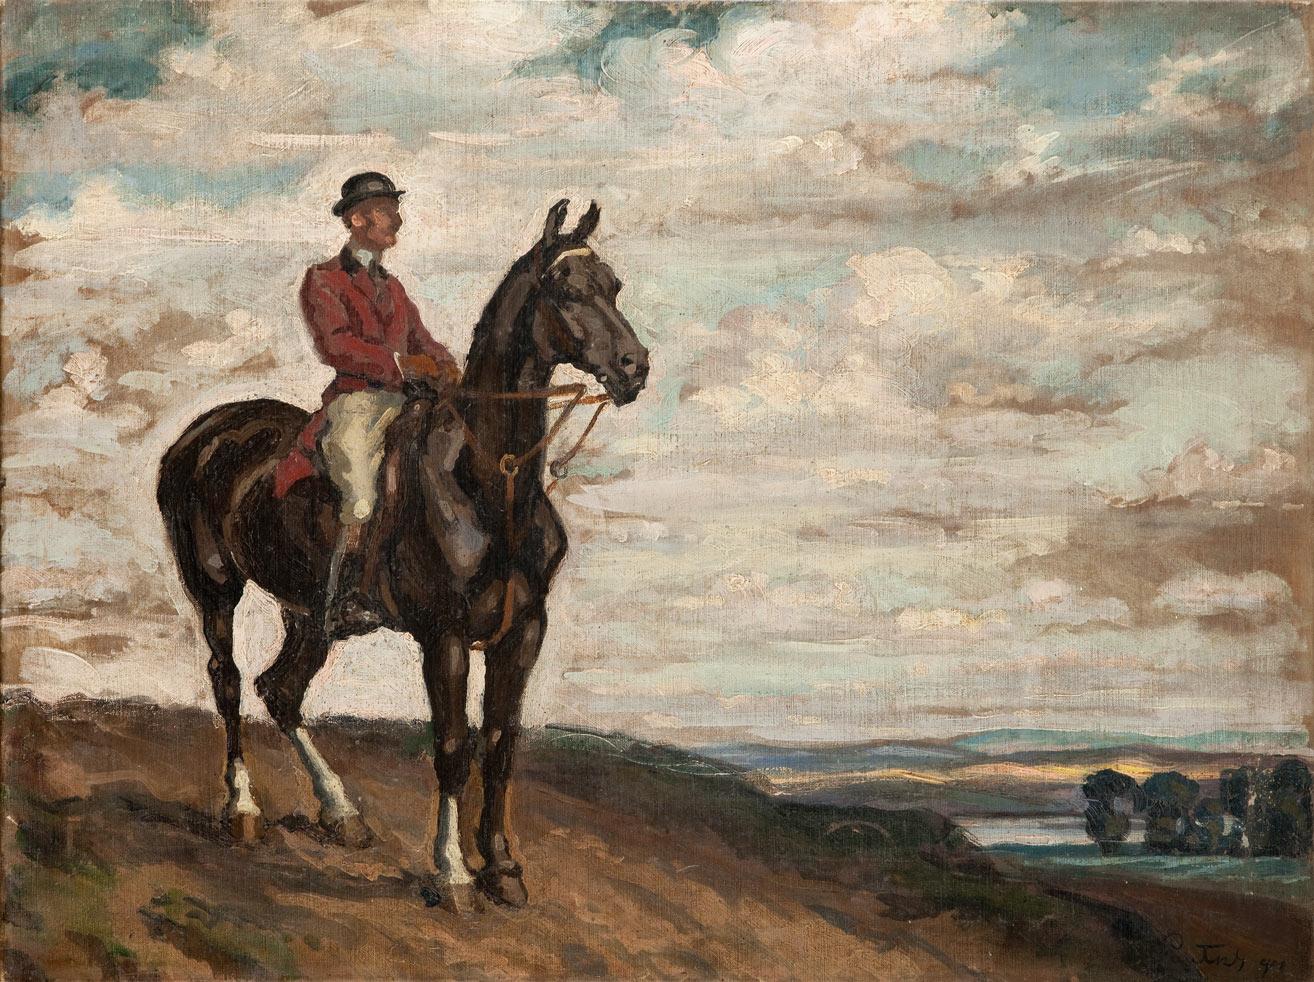 Jeździec na koniu, 1908